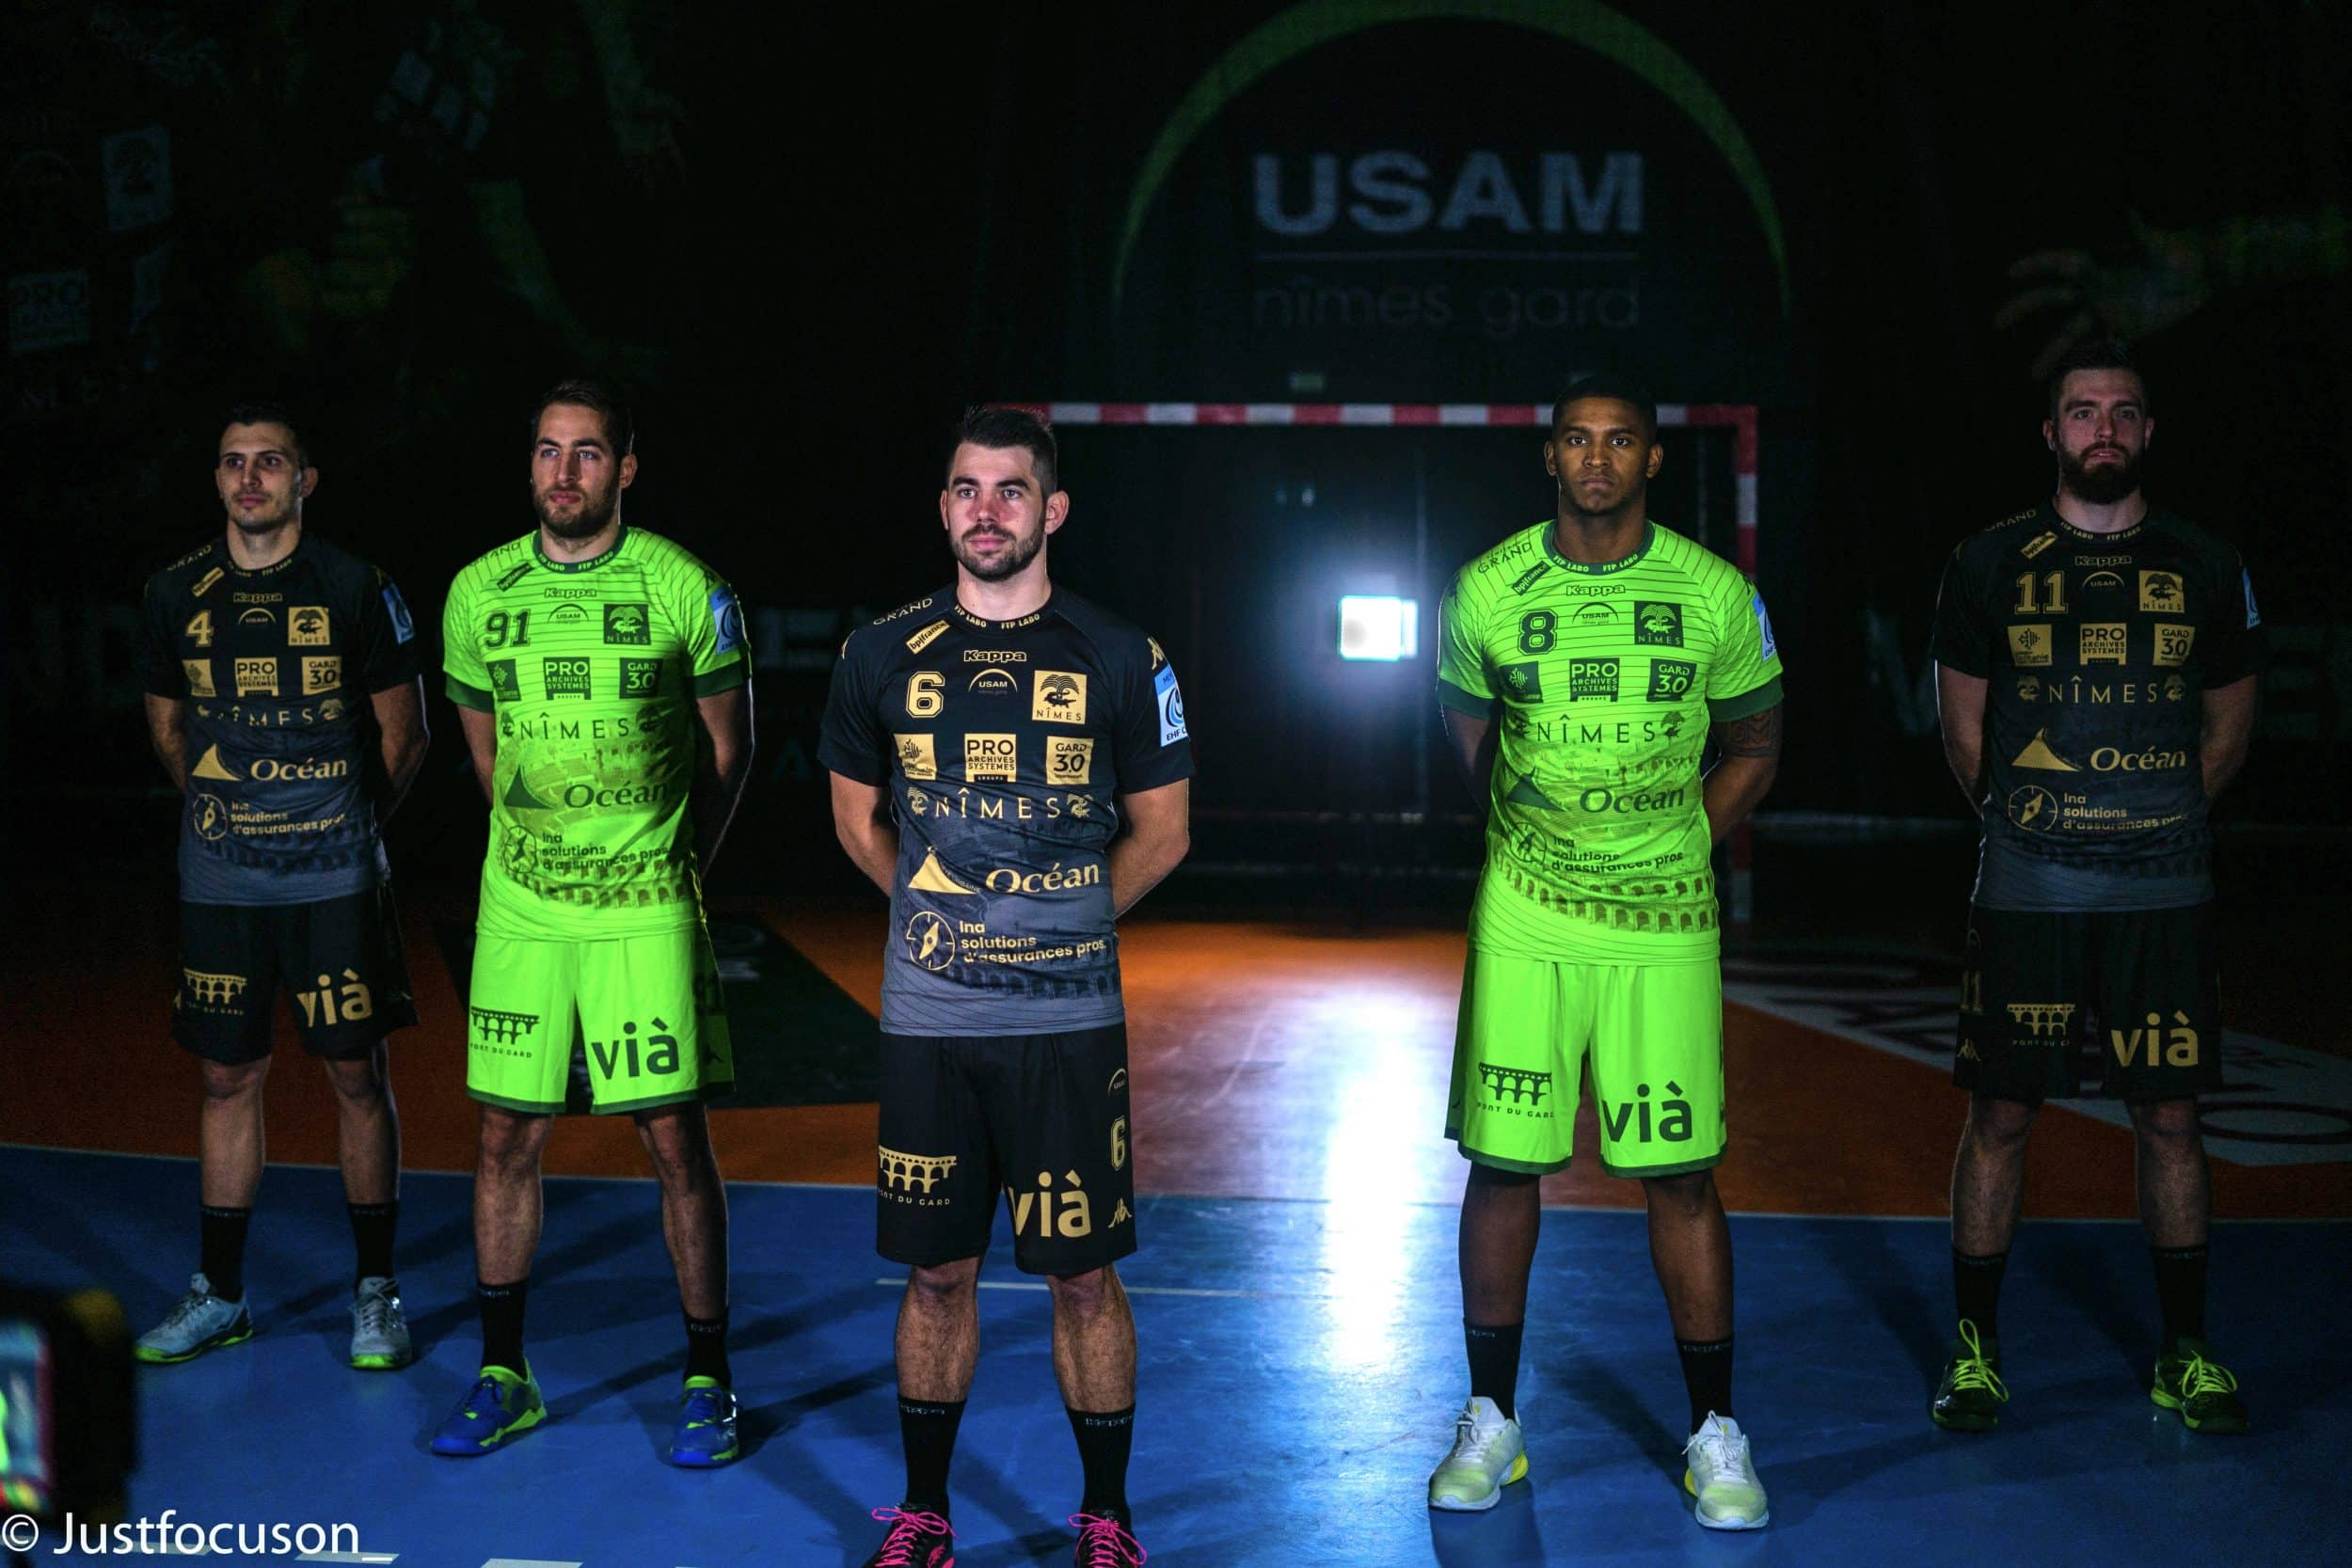 maillot-handball-usam-nimes-gard-europe-2019-2020-1